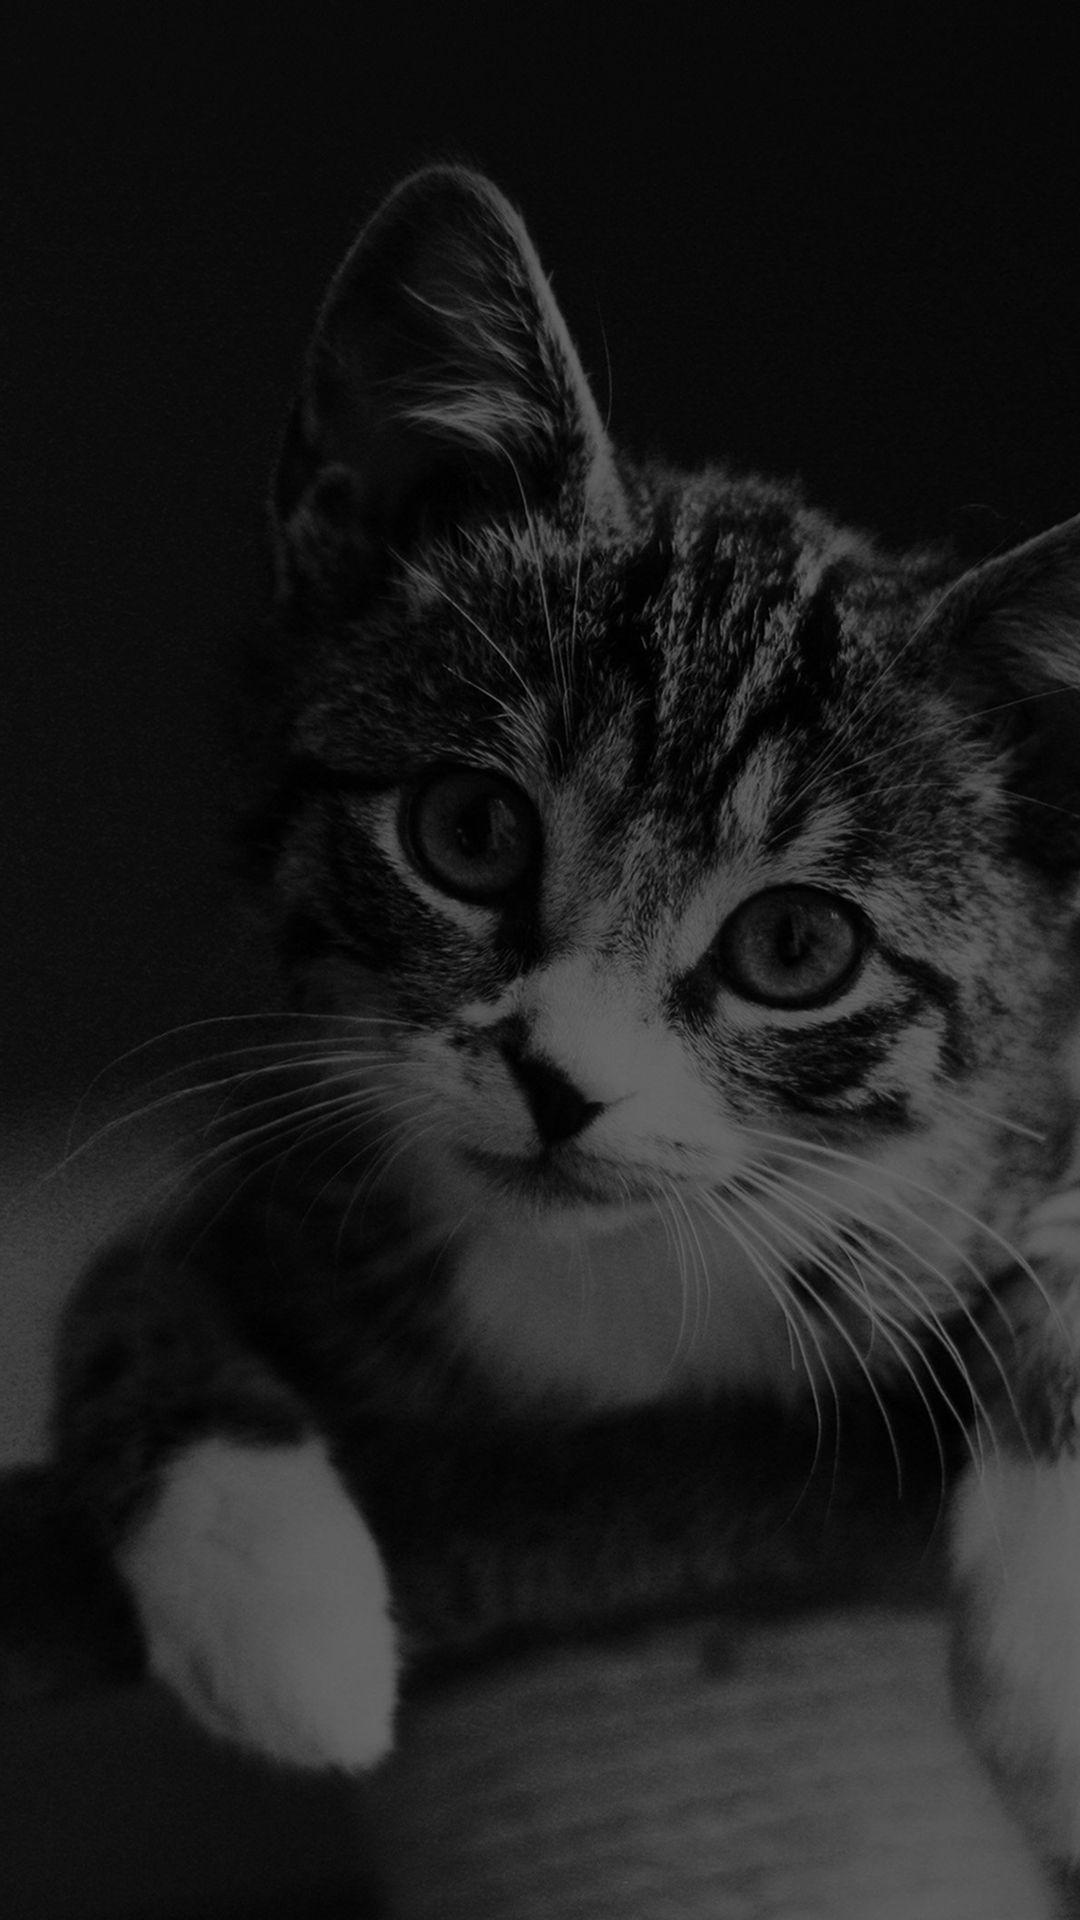 Cute Cat Look Dark Bw Animal Love Nature Iphone 6 Wallpaper Cat Phone Wallpaper Iphone 6 Wallpaper Black And White Nature Iphone Wallpaper